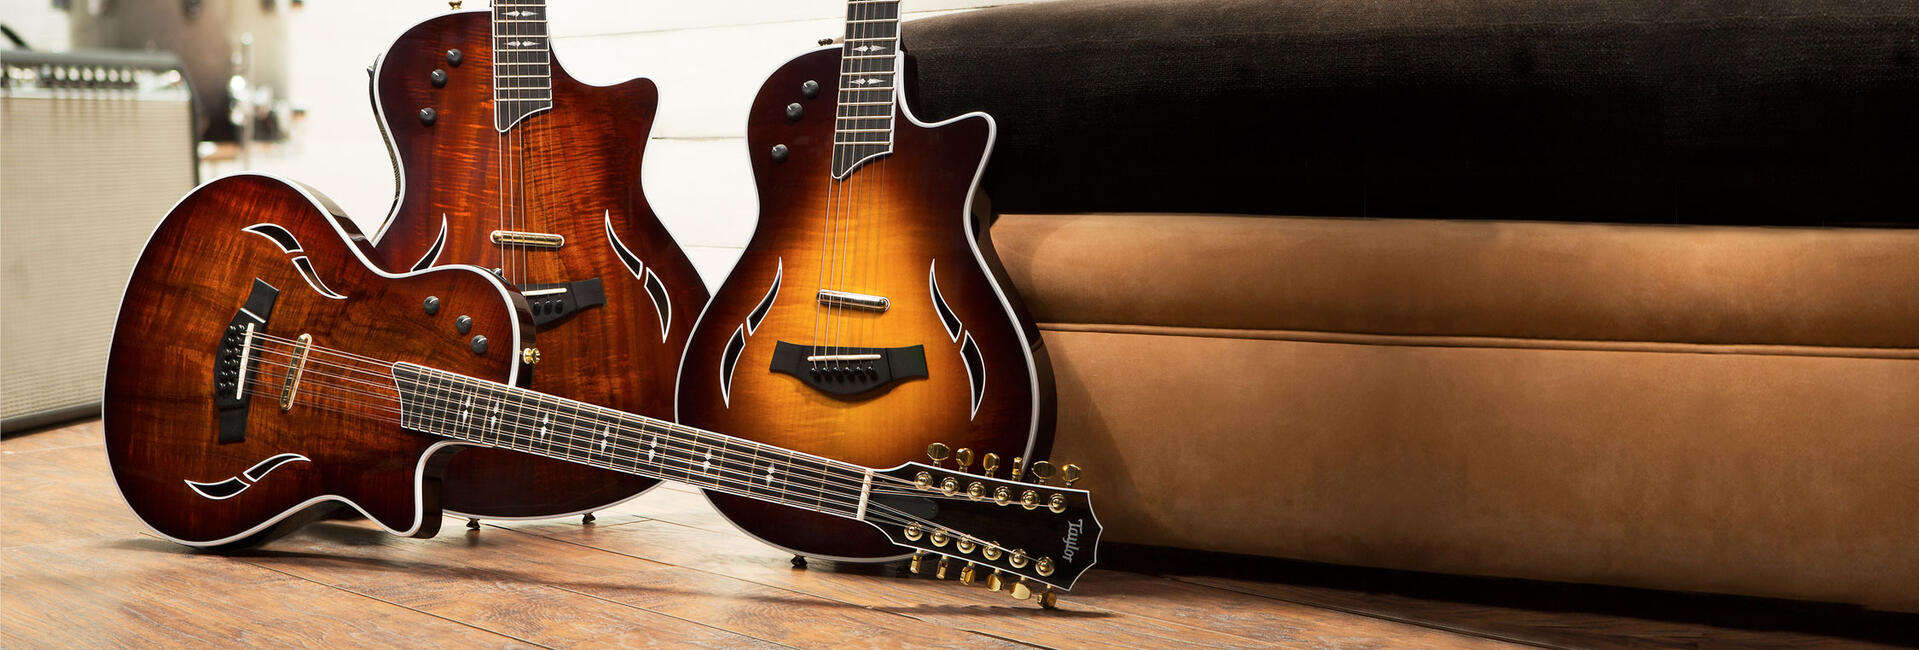 wiring diagram for les paul style guitar 91 honda crx electric guitars taylor